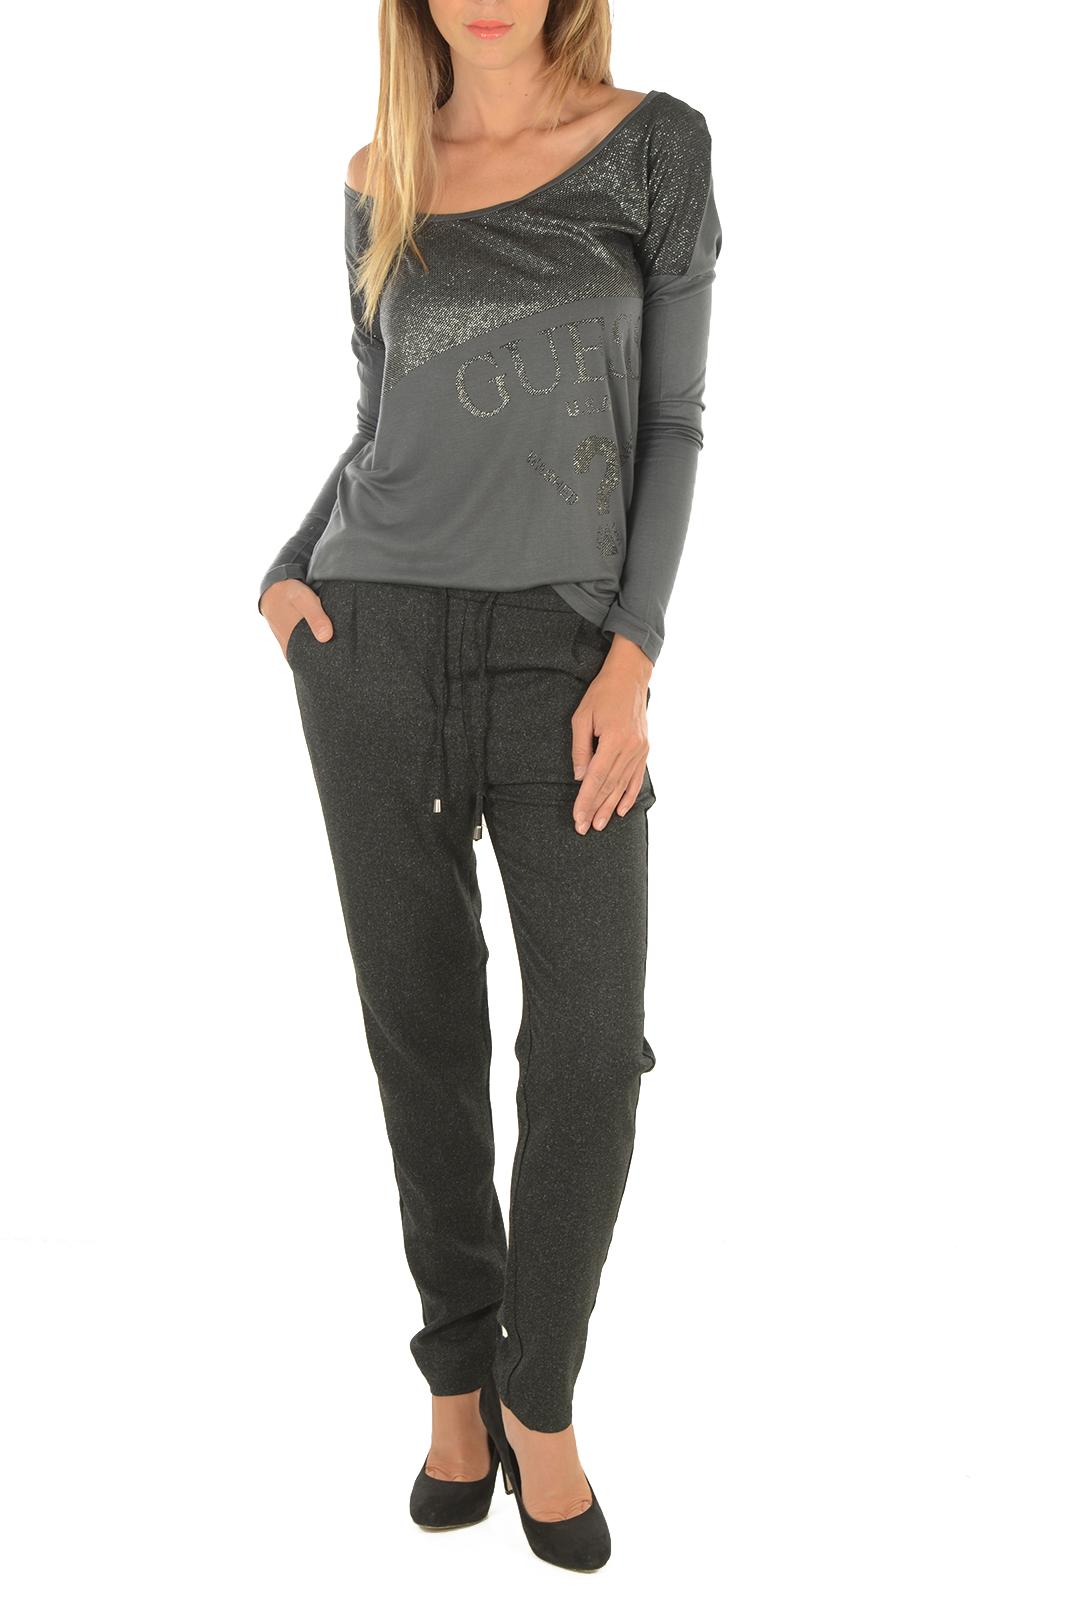 Pantalons  Vero moda RORY NW LOOSE SP STRING PANT BLACK/SALT AND P